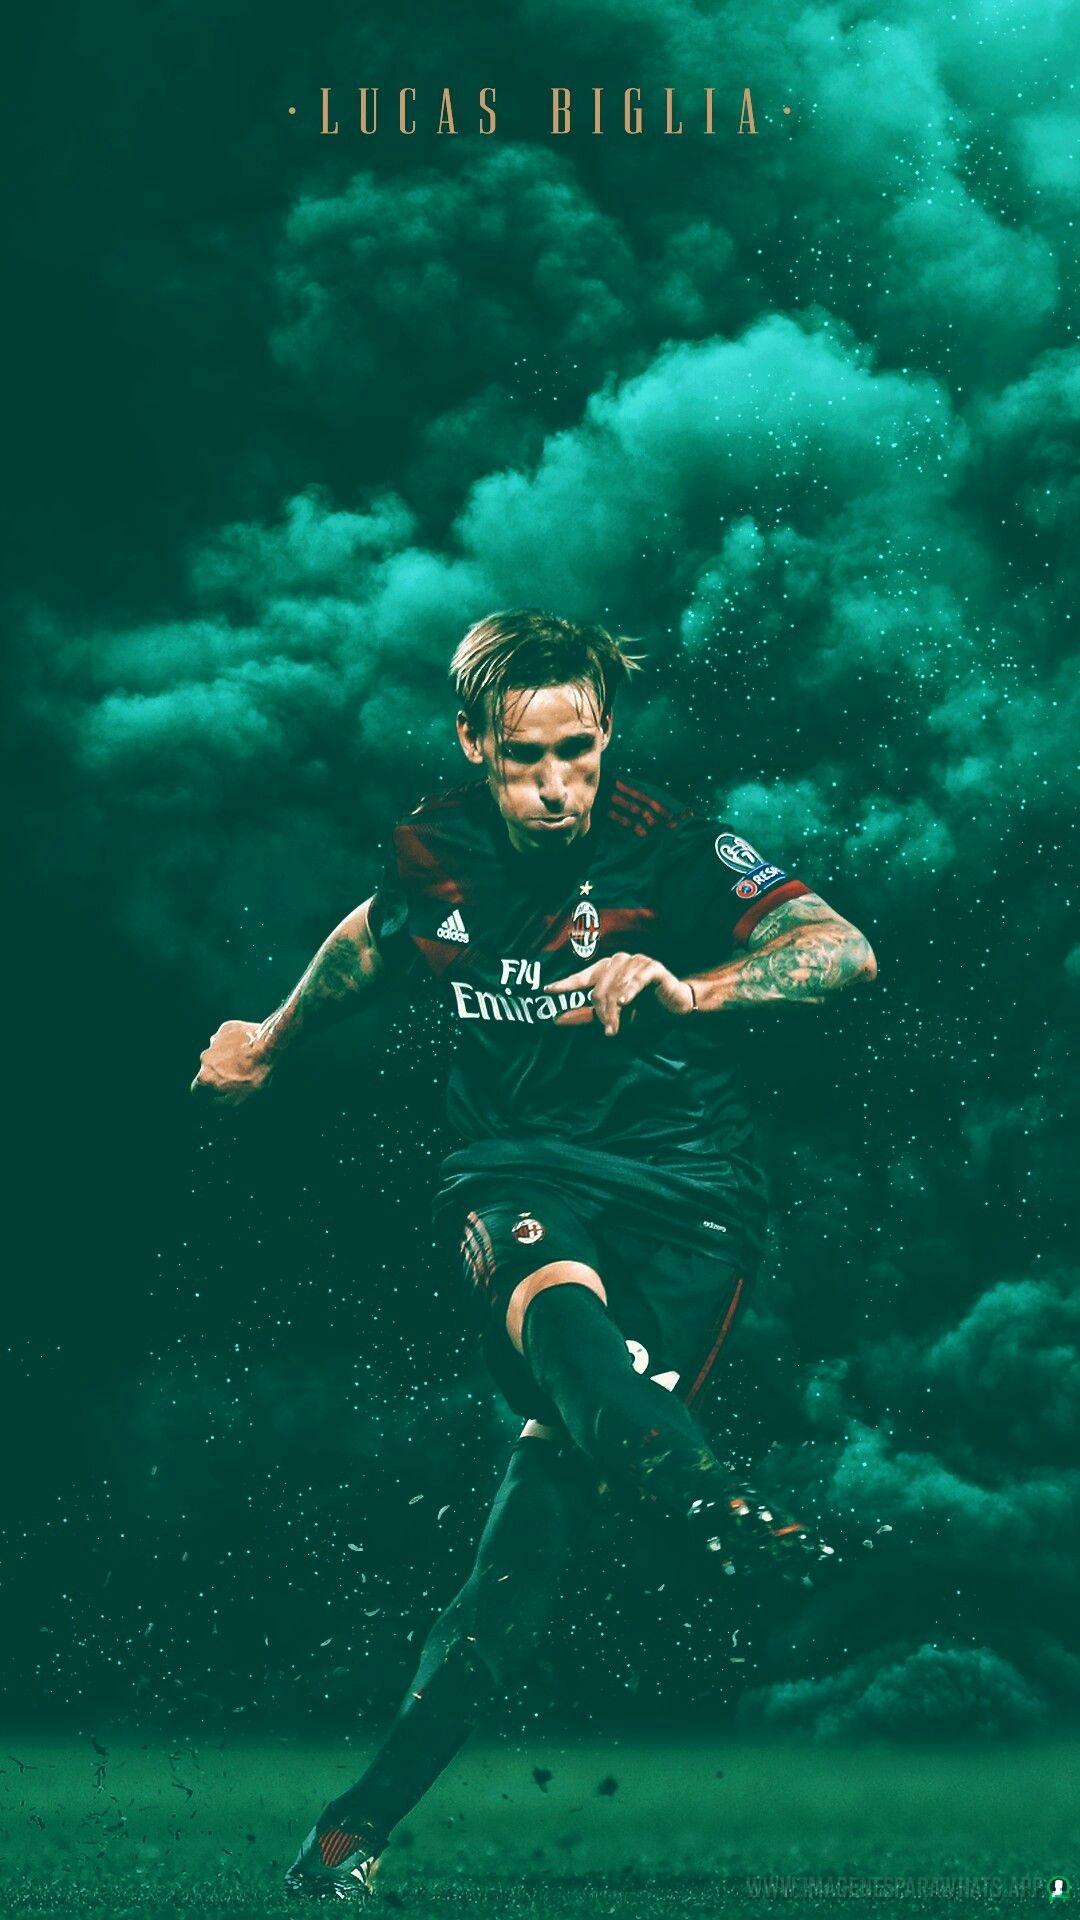 Imagenes de Futbol (1216)